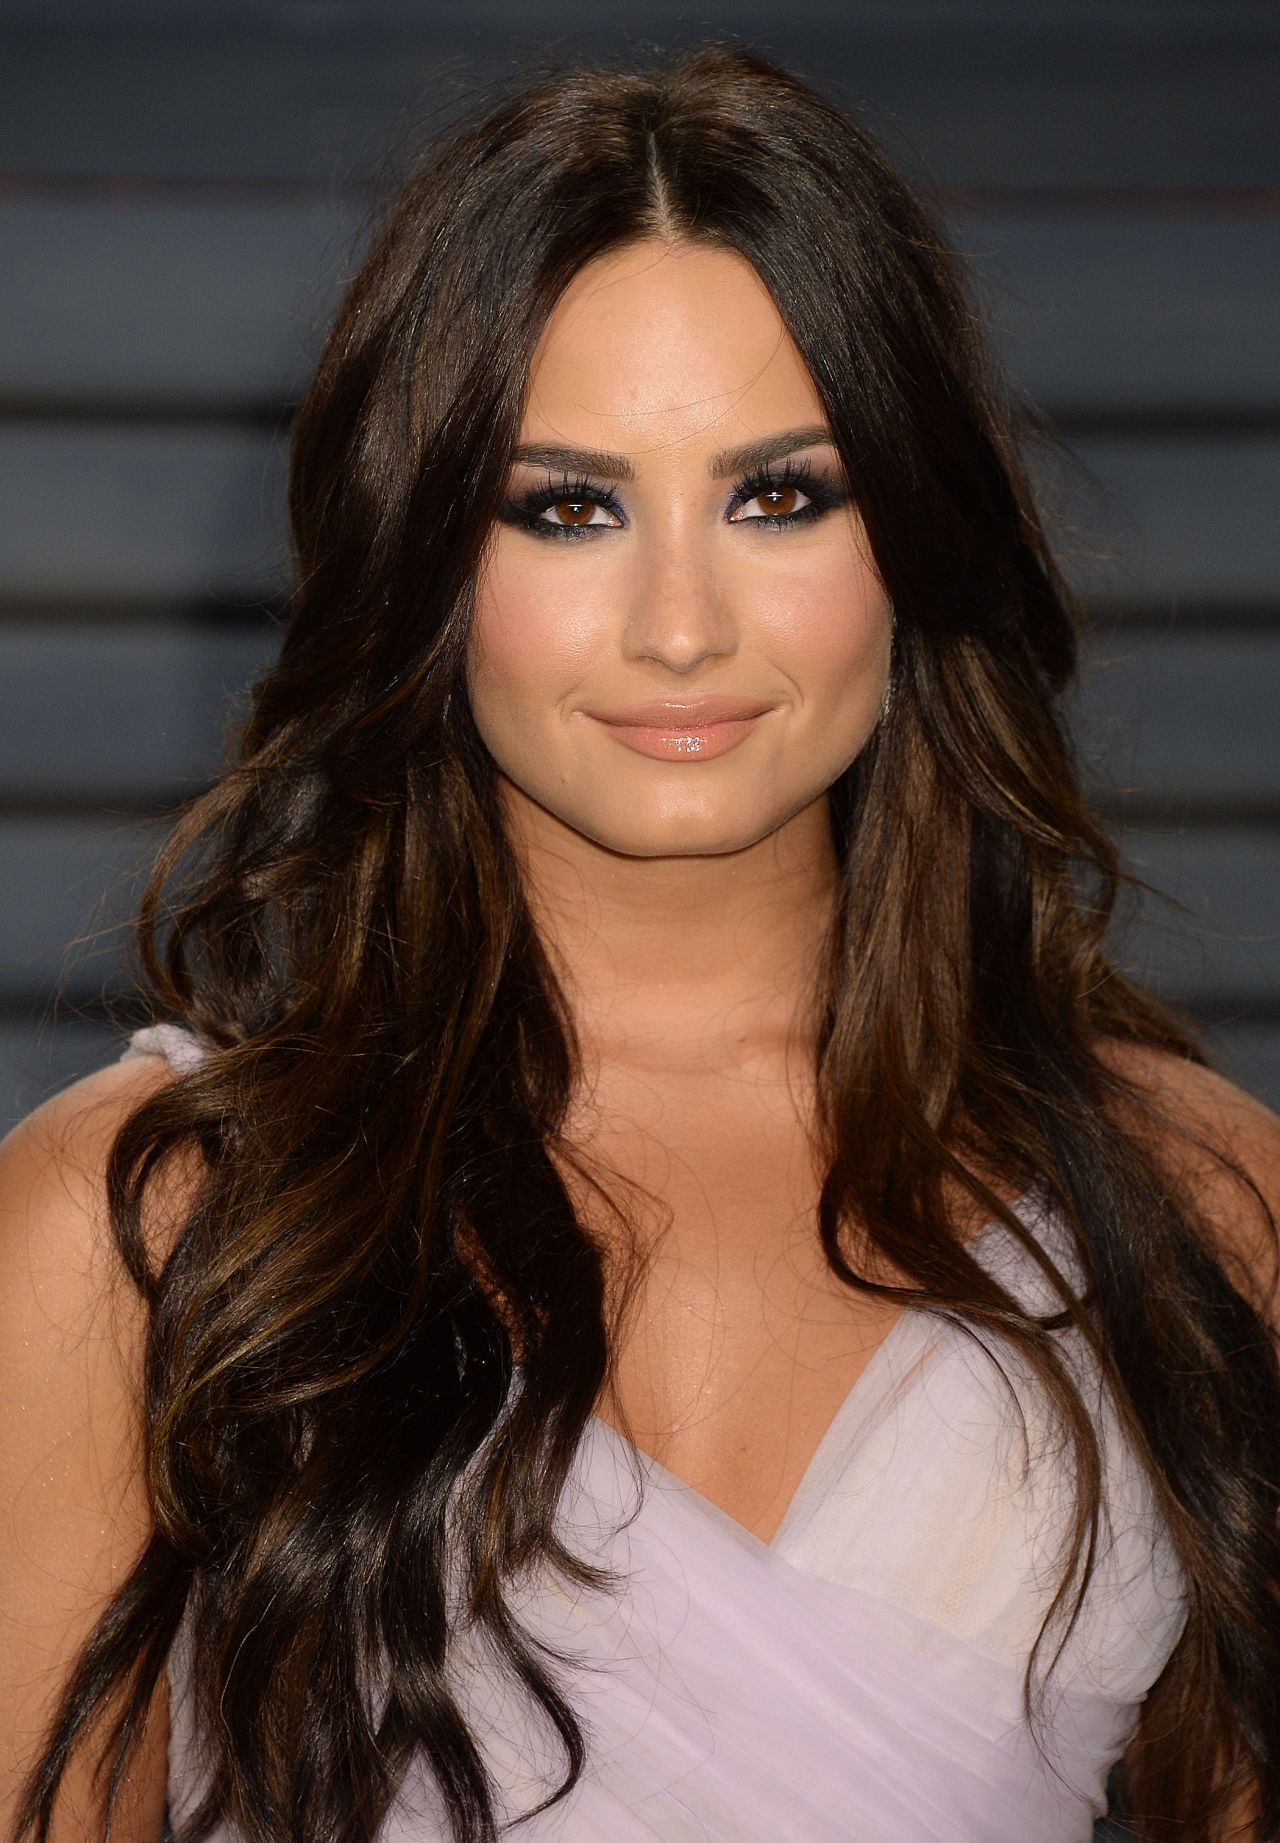 Demi Lovato At Vanity Fair Oscar 2017 Party In Los Angeles -8328